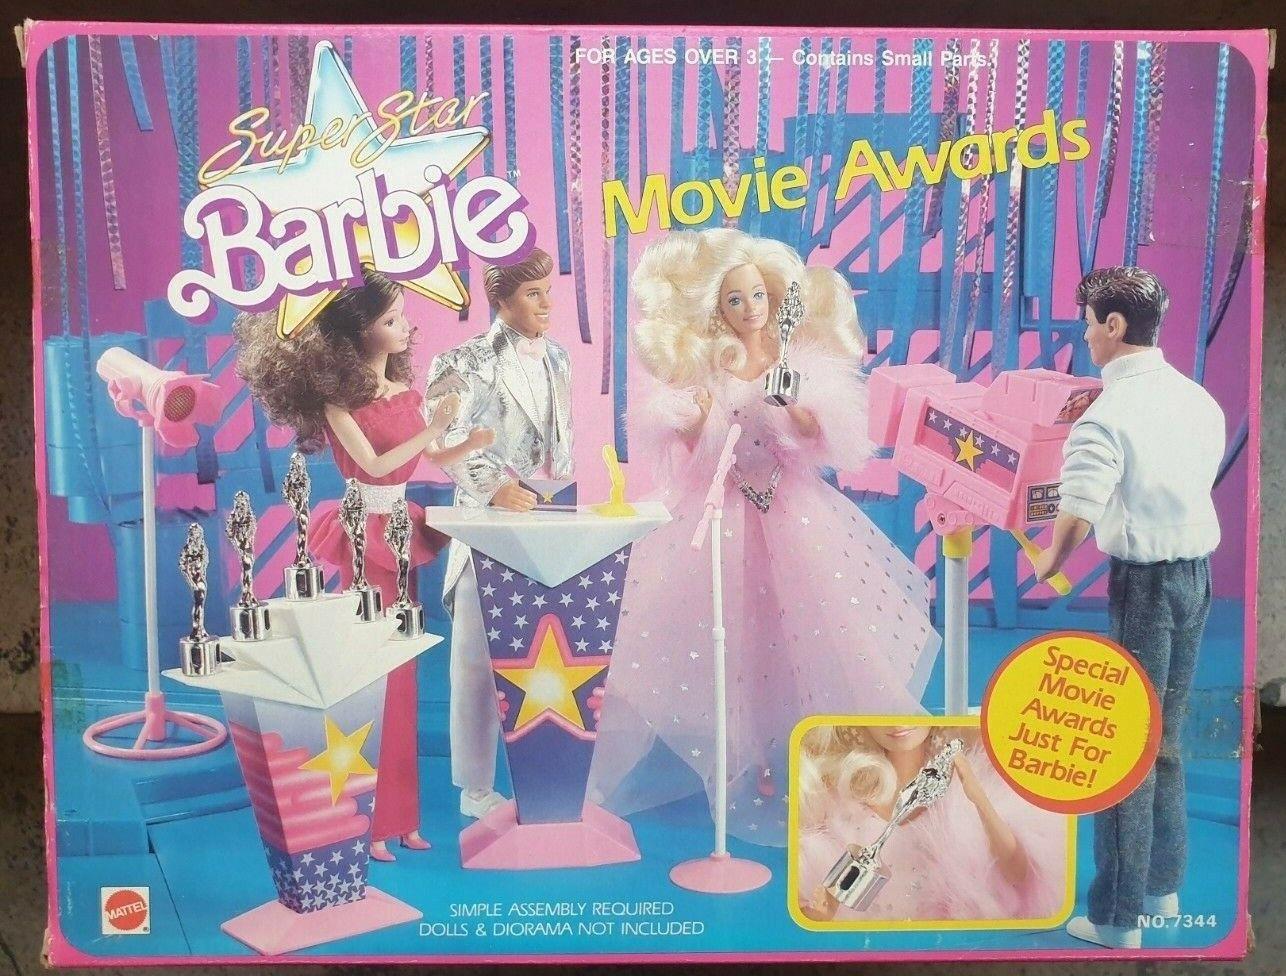 Barbie Barbie Barbie Mattel  Super Star Movie Awards Playset Vintage 88' 90b99c